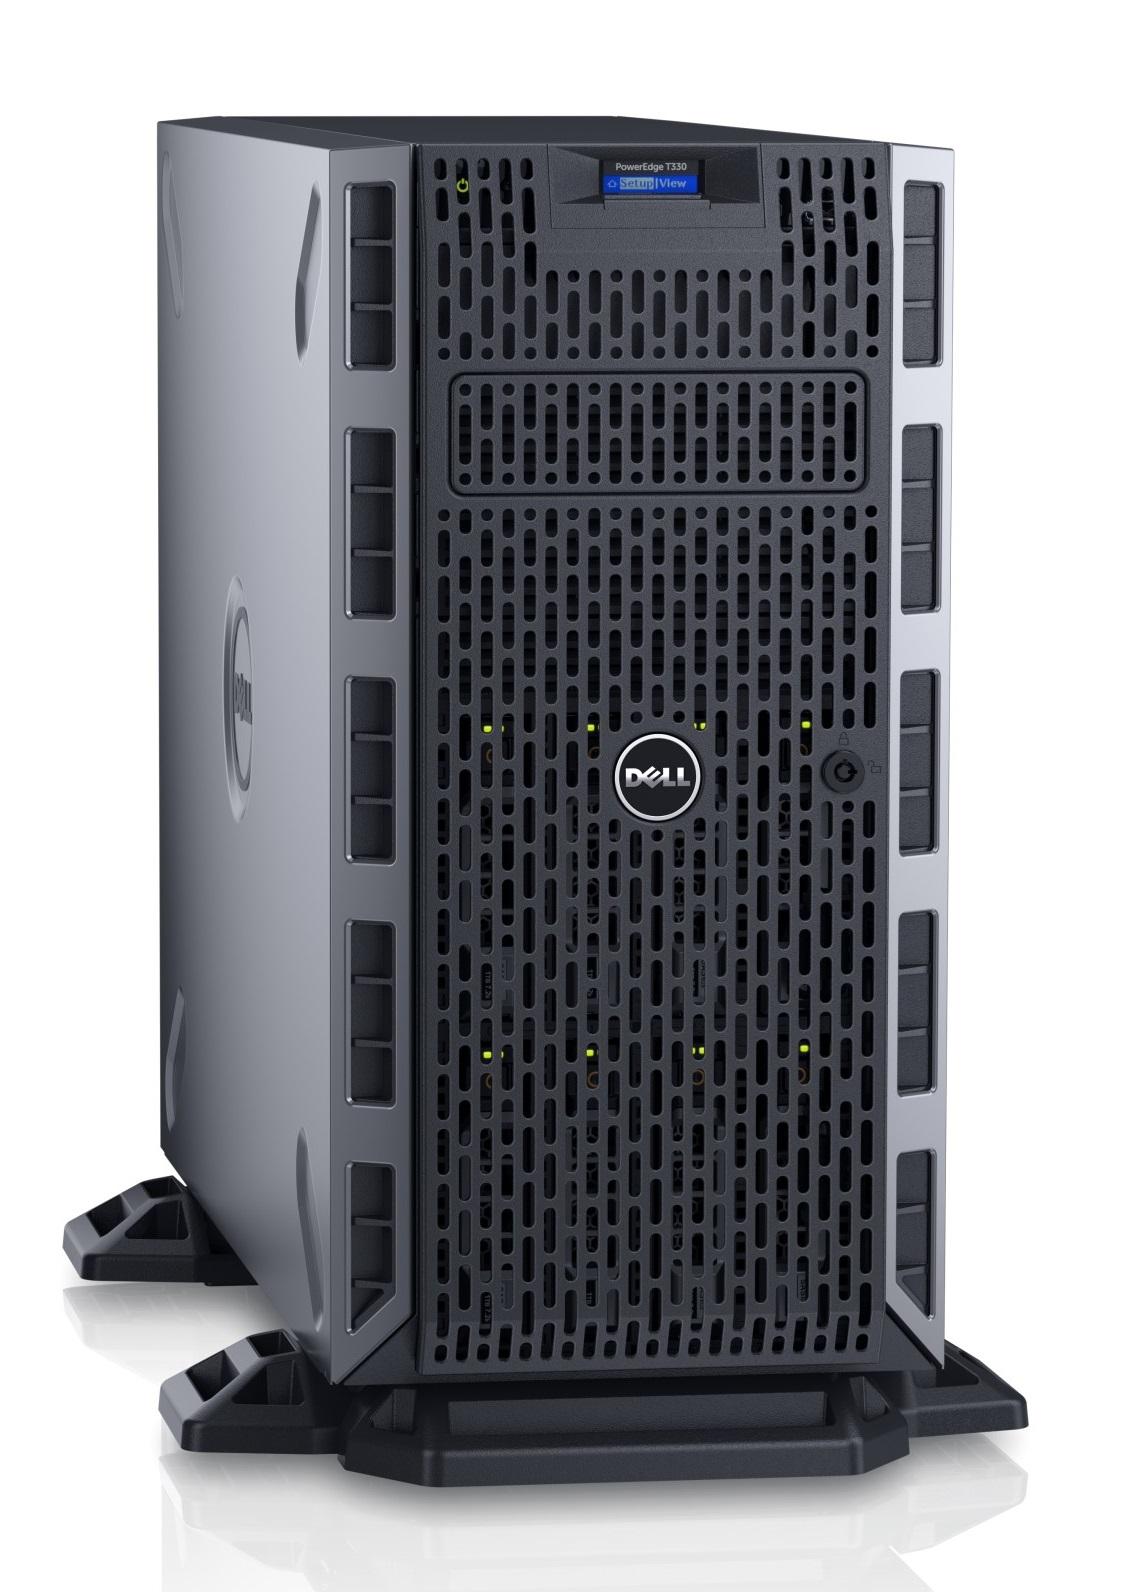 DELL server PowerEdge T330 E3-1230/ 16G/ 4x1TB NL-SAS/ H730/ iDrac/ 1x495W/ 3yNBD PS